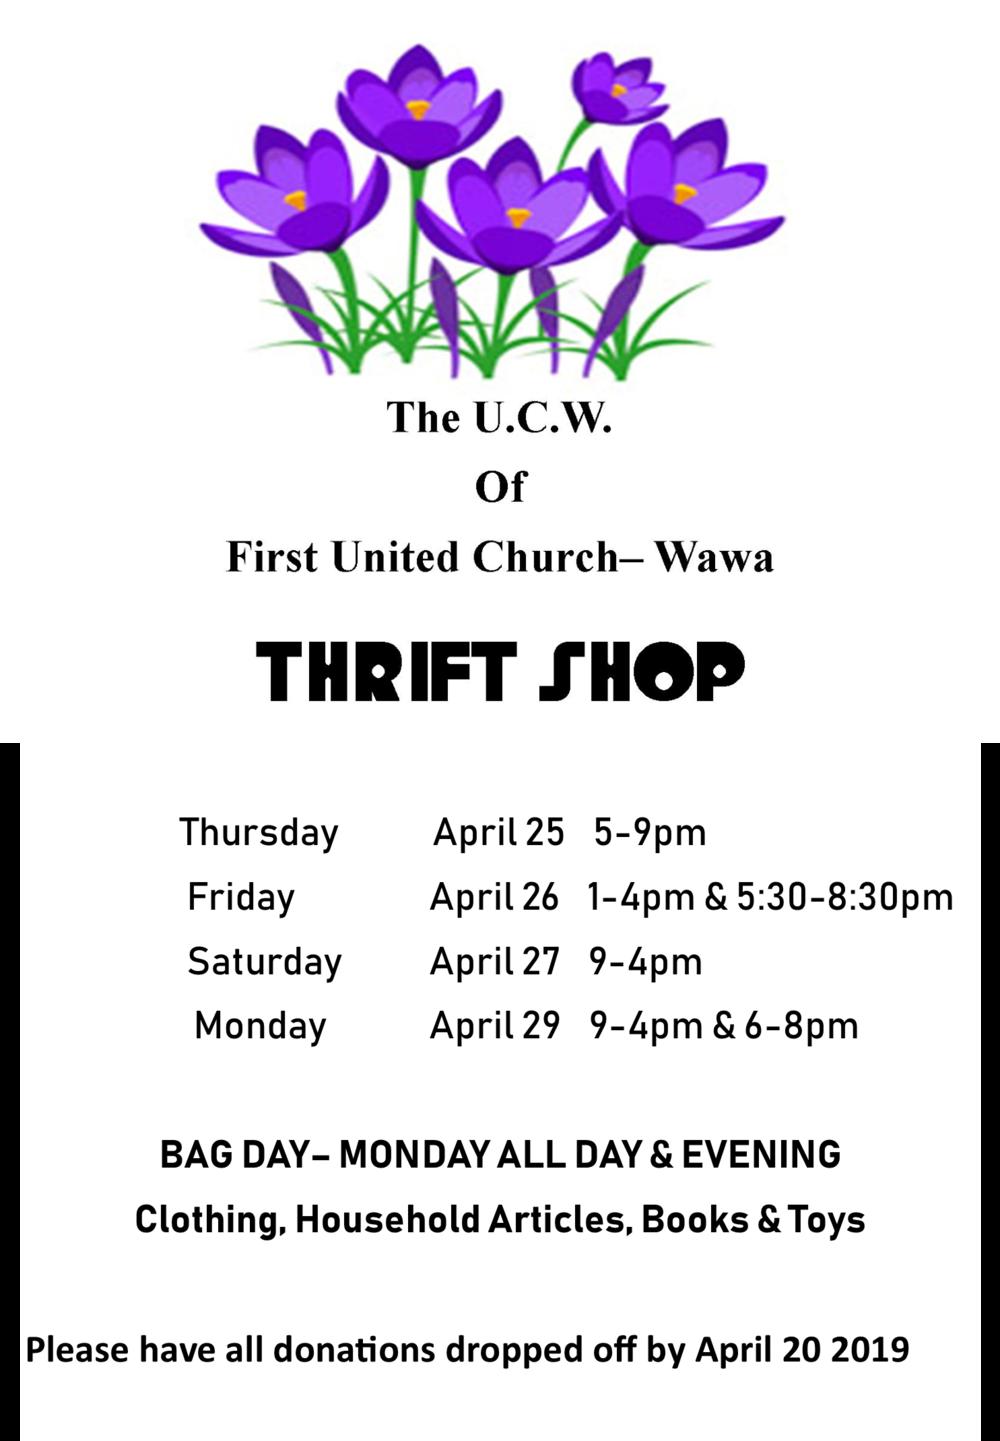 april 25-2- ucw thrift shop 2019.png